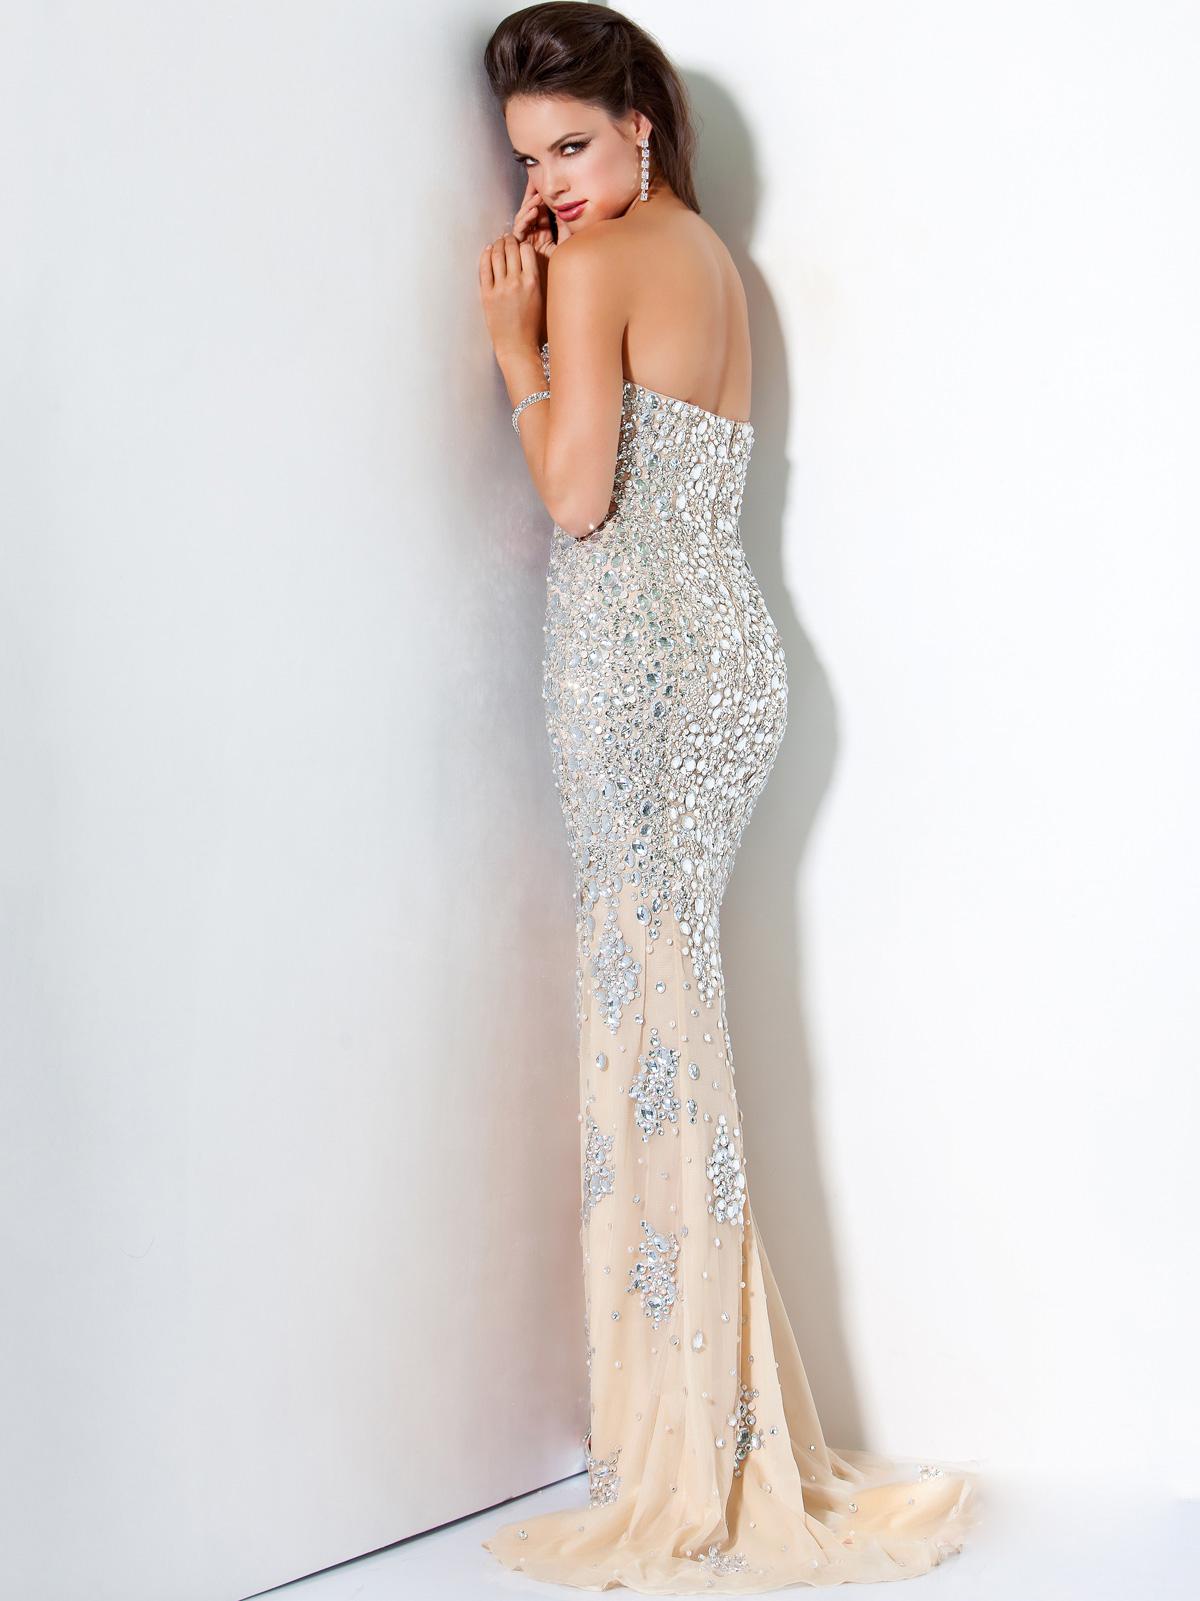 Silver Nude Crystal Encrusted Prom Evening Dress Jovani 4247 [SH165] - $258.00 :